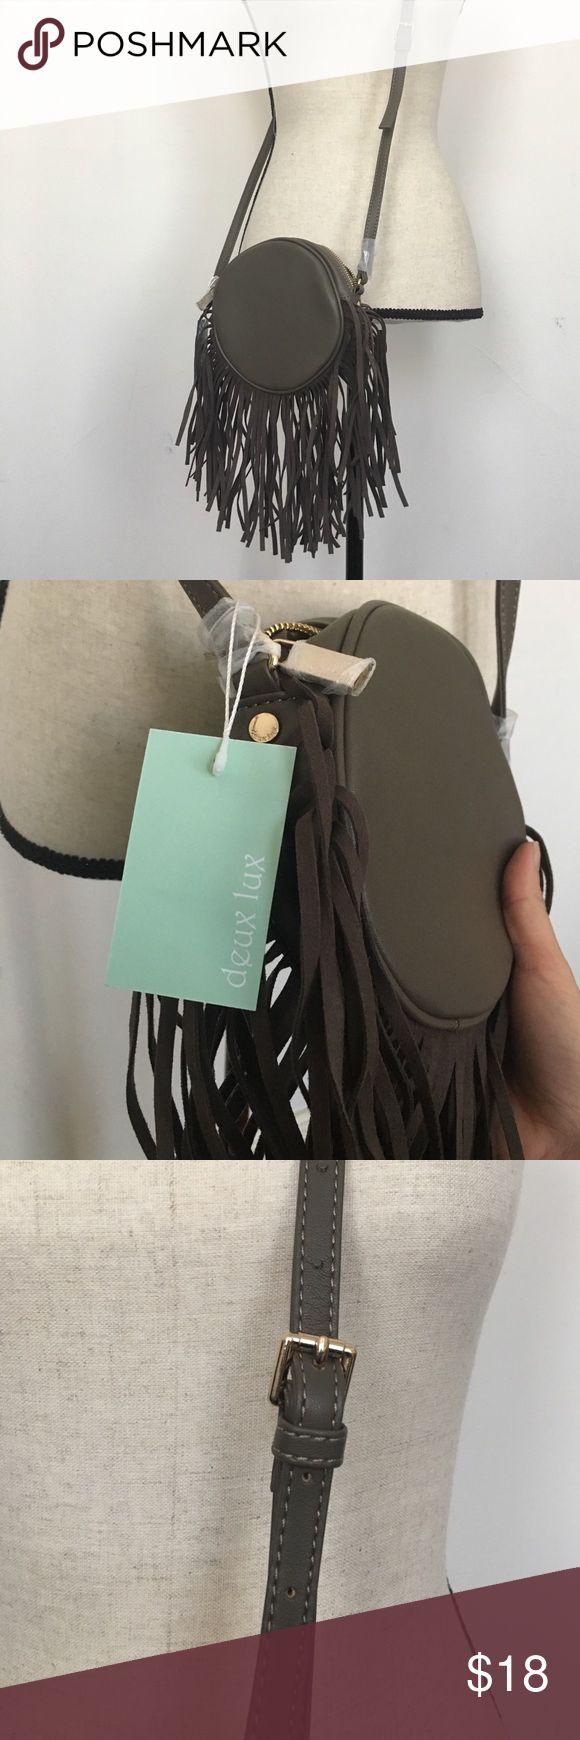 NWT DEUX LUX Joplin Fringe cross body purse Perfect for festival season! Deux Lux Bags Crossbody Bags